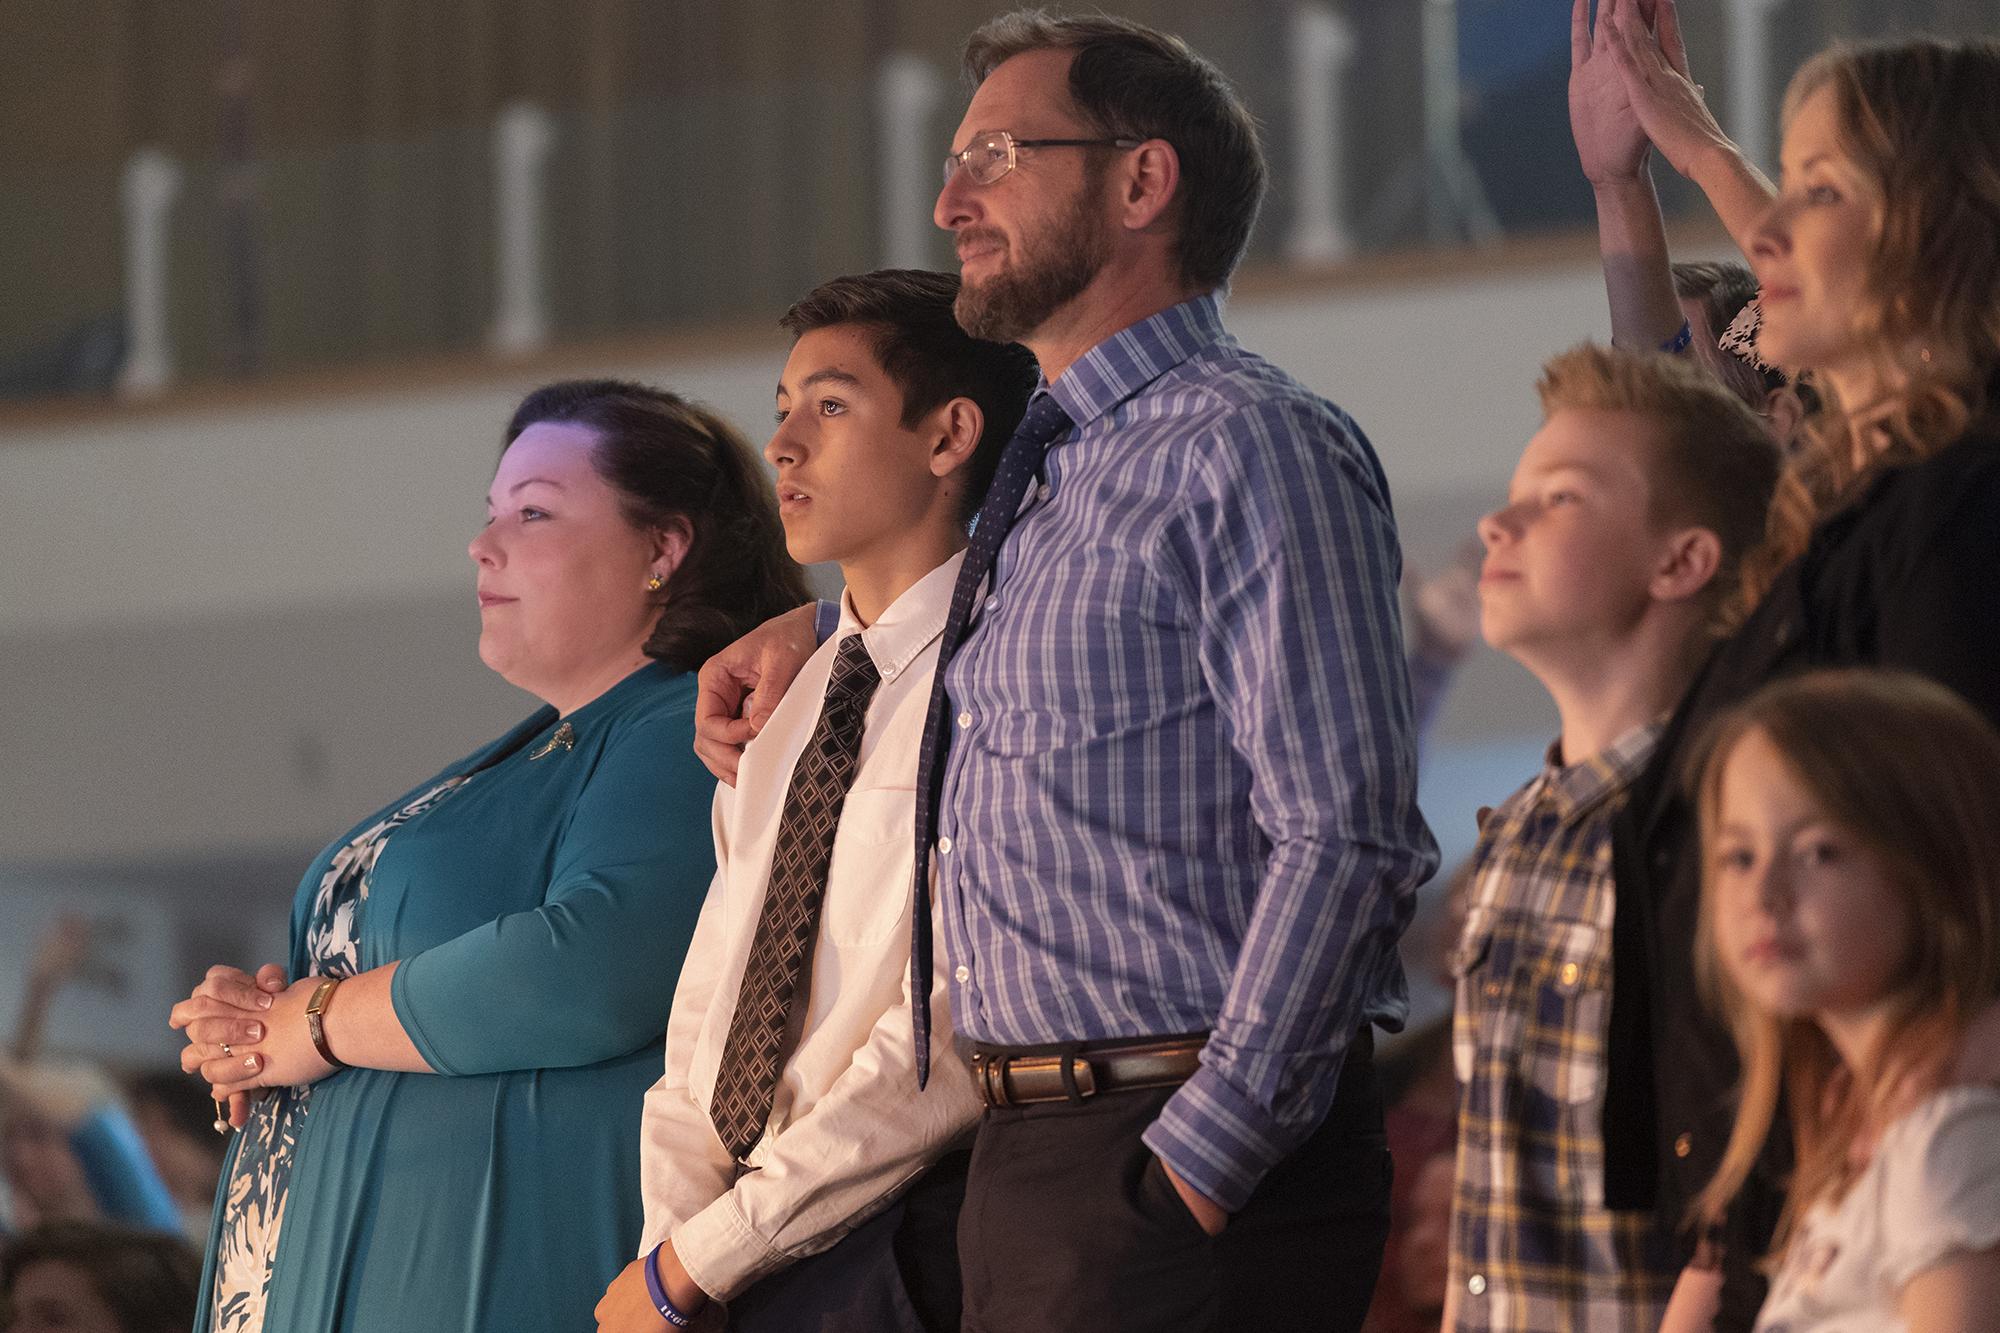 "Chrissy Metz (Joyce Smith), Marcel Ruiz (John Smith), and Josh Lucas (Brian Smith), shown in a scene at church, star in 20th Century Fox's ""Breakthrough."" Photo by Allen Fraser."